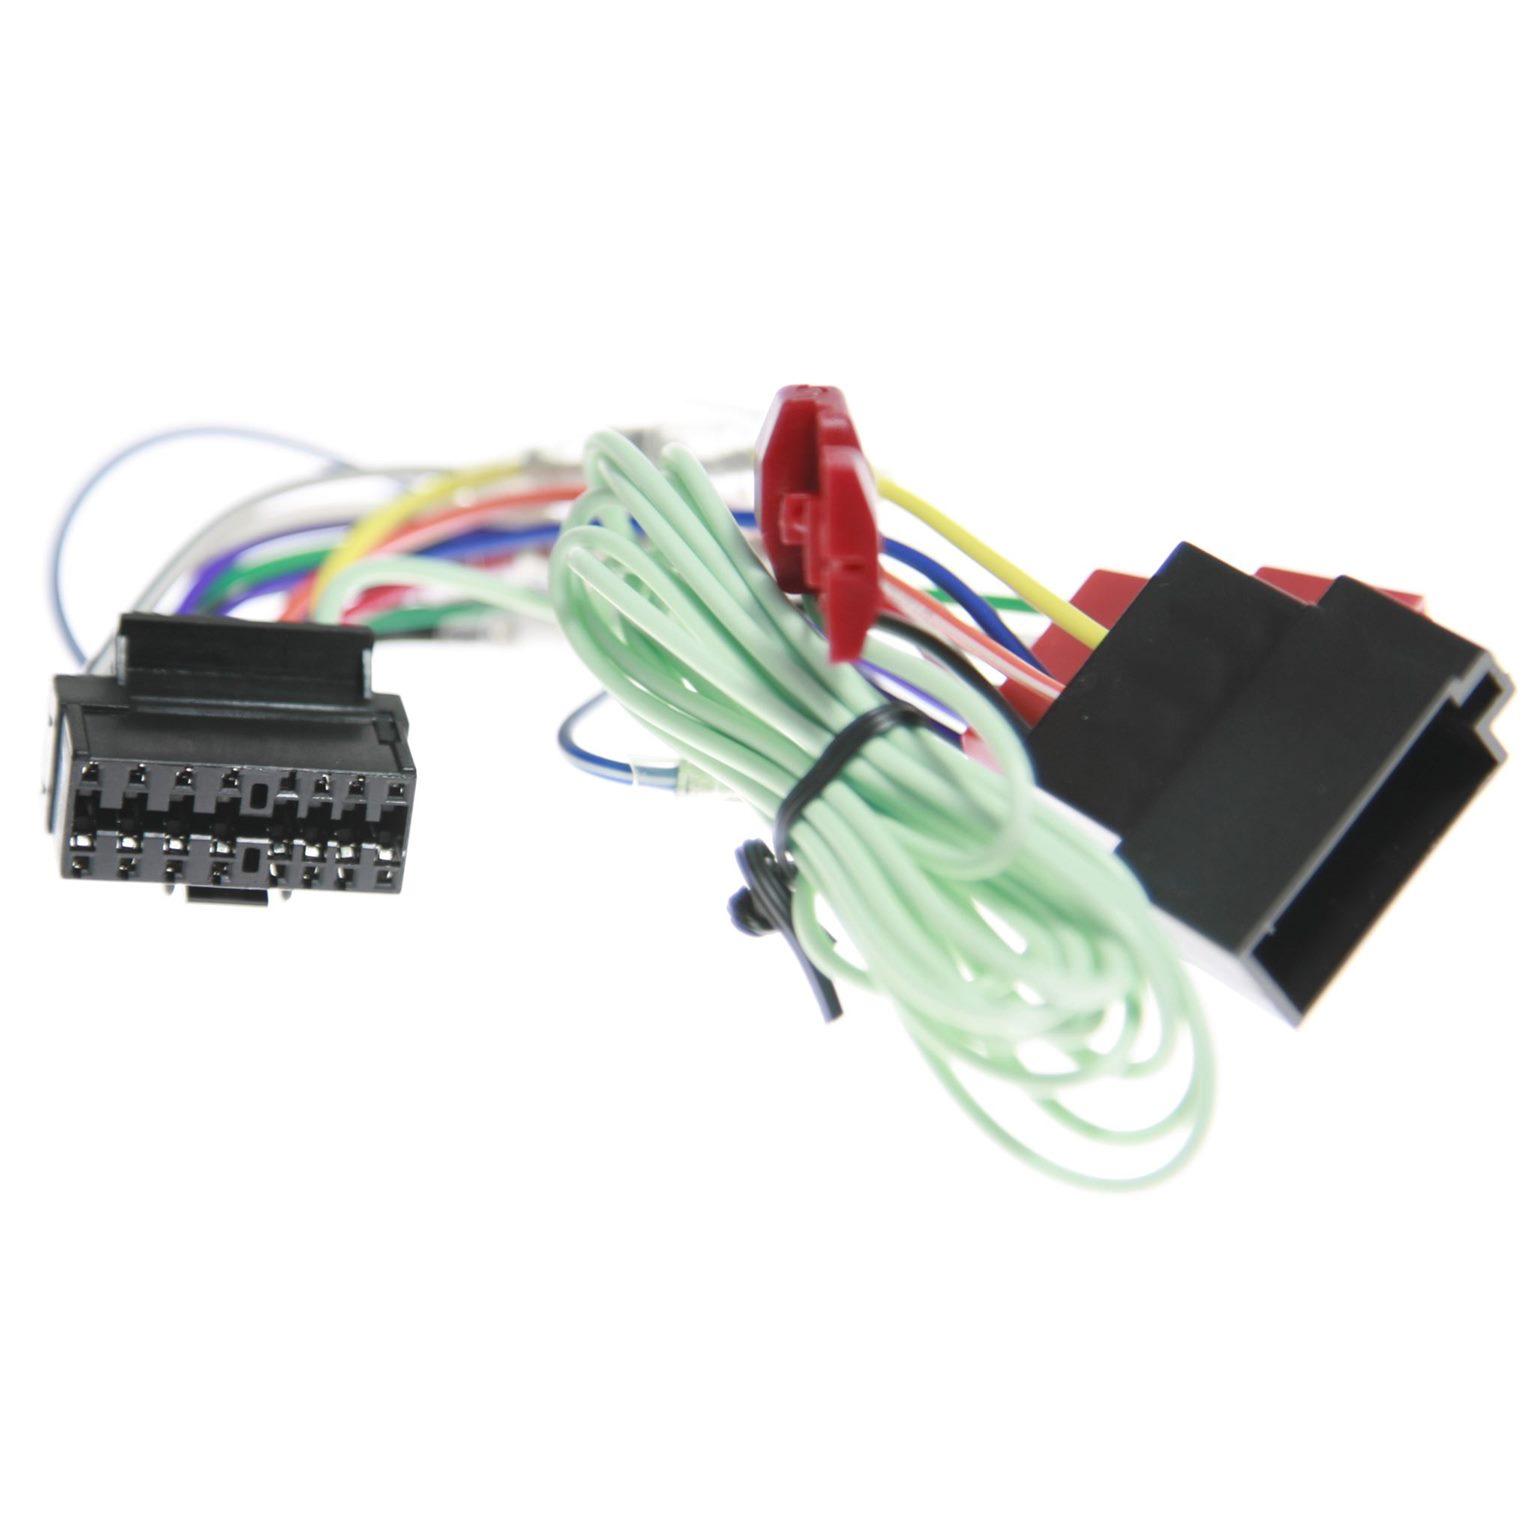 sony to iso harness plug connector for sony xav 63 xav 64bt xav rh trademe co nz